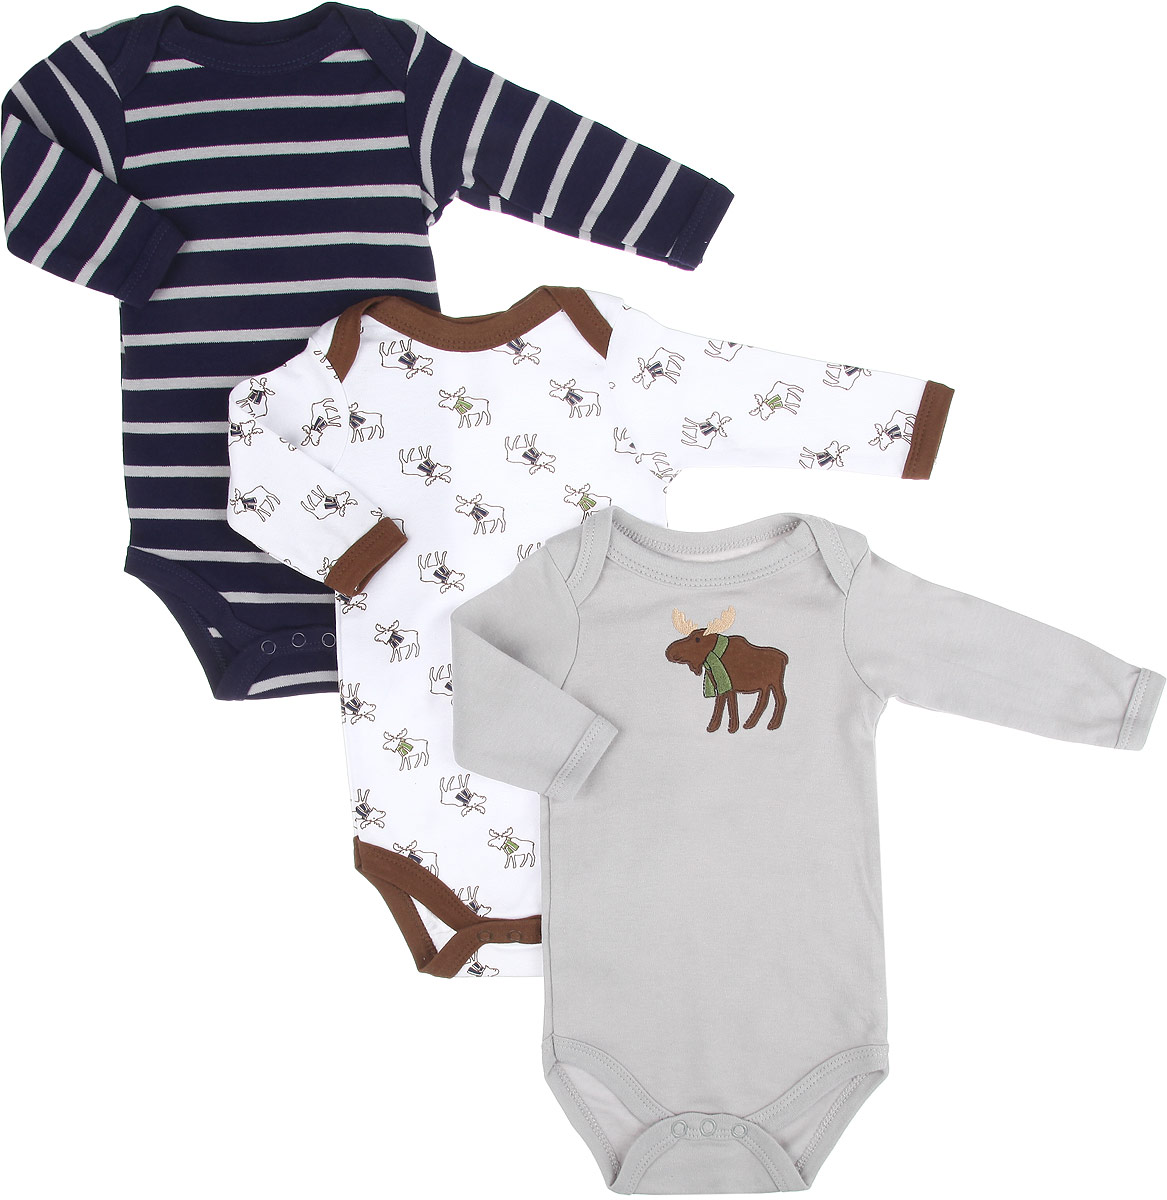 Боди для мальчика Hudson Baby Лось, цвет: серый, белый, темно-синий, 3 шт. 55128. Размер 61/67, 3-6 месяцев hudson baby комплект для мальчика боди и штанишки для мальчика hudson baby